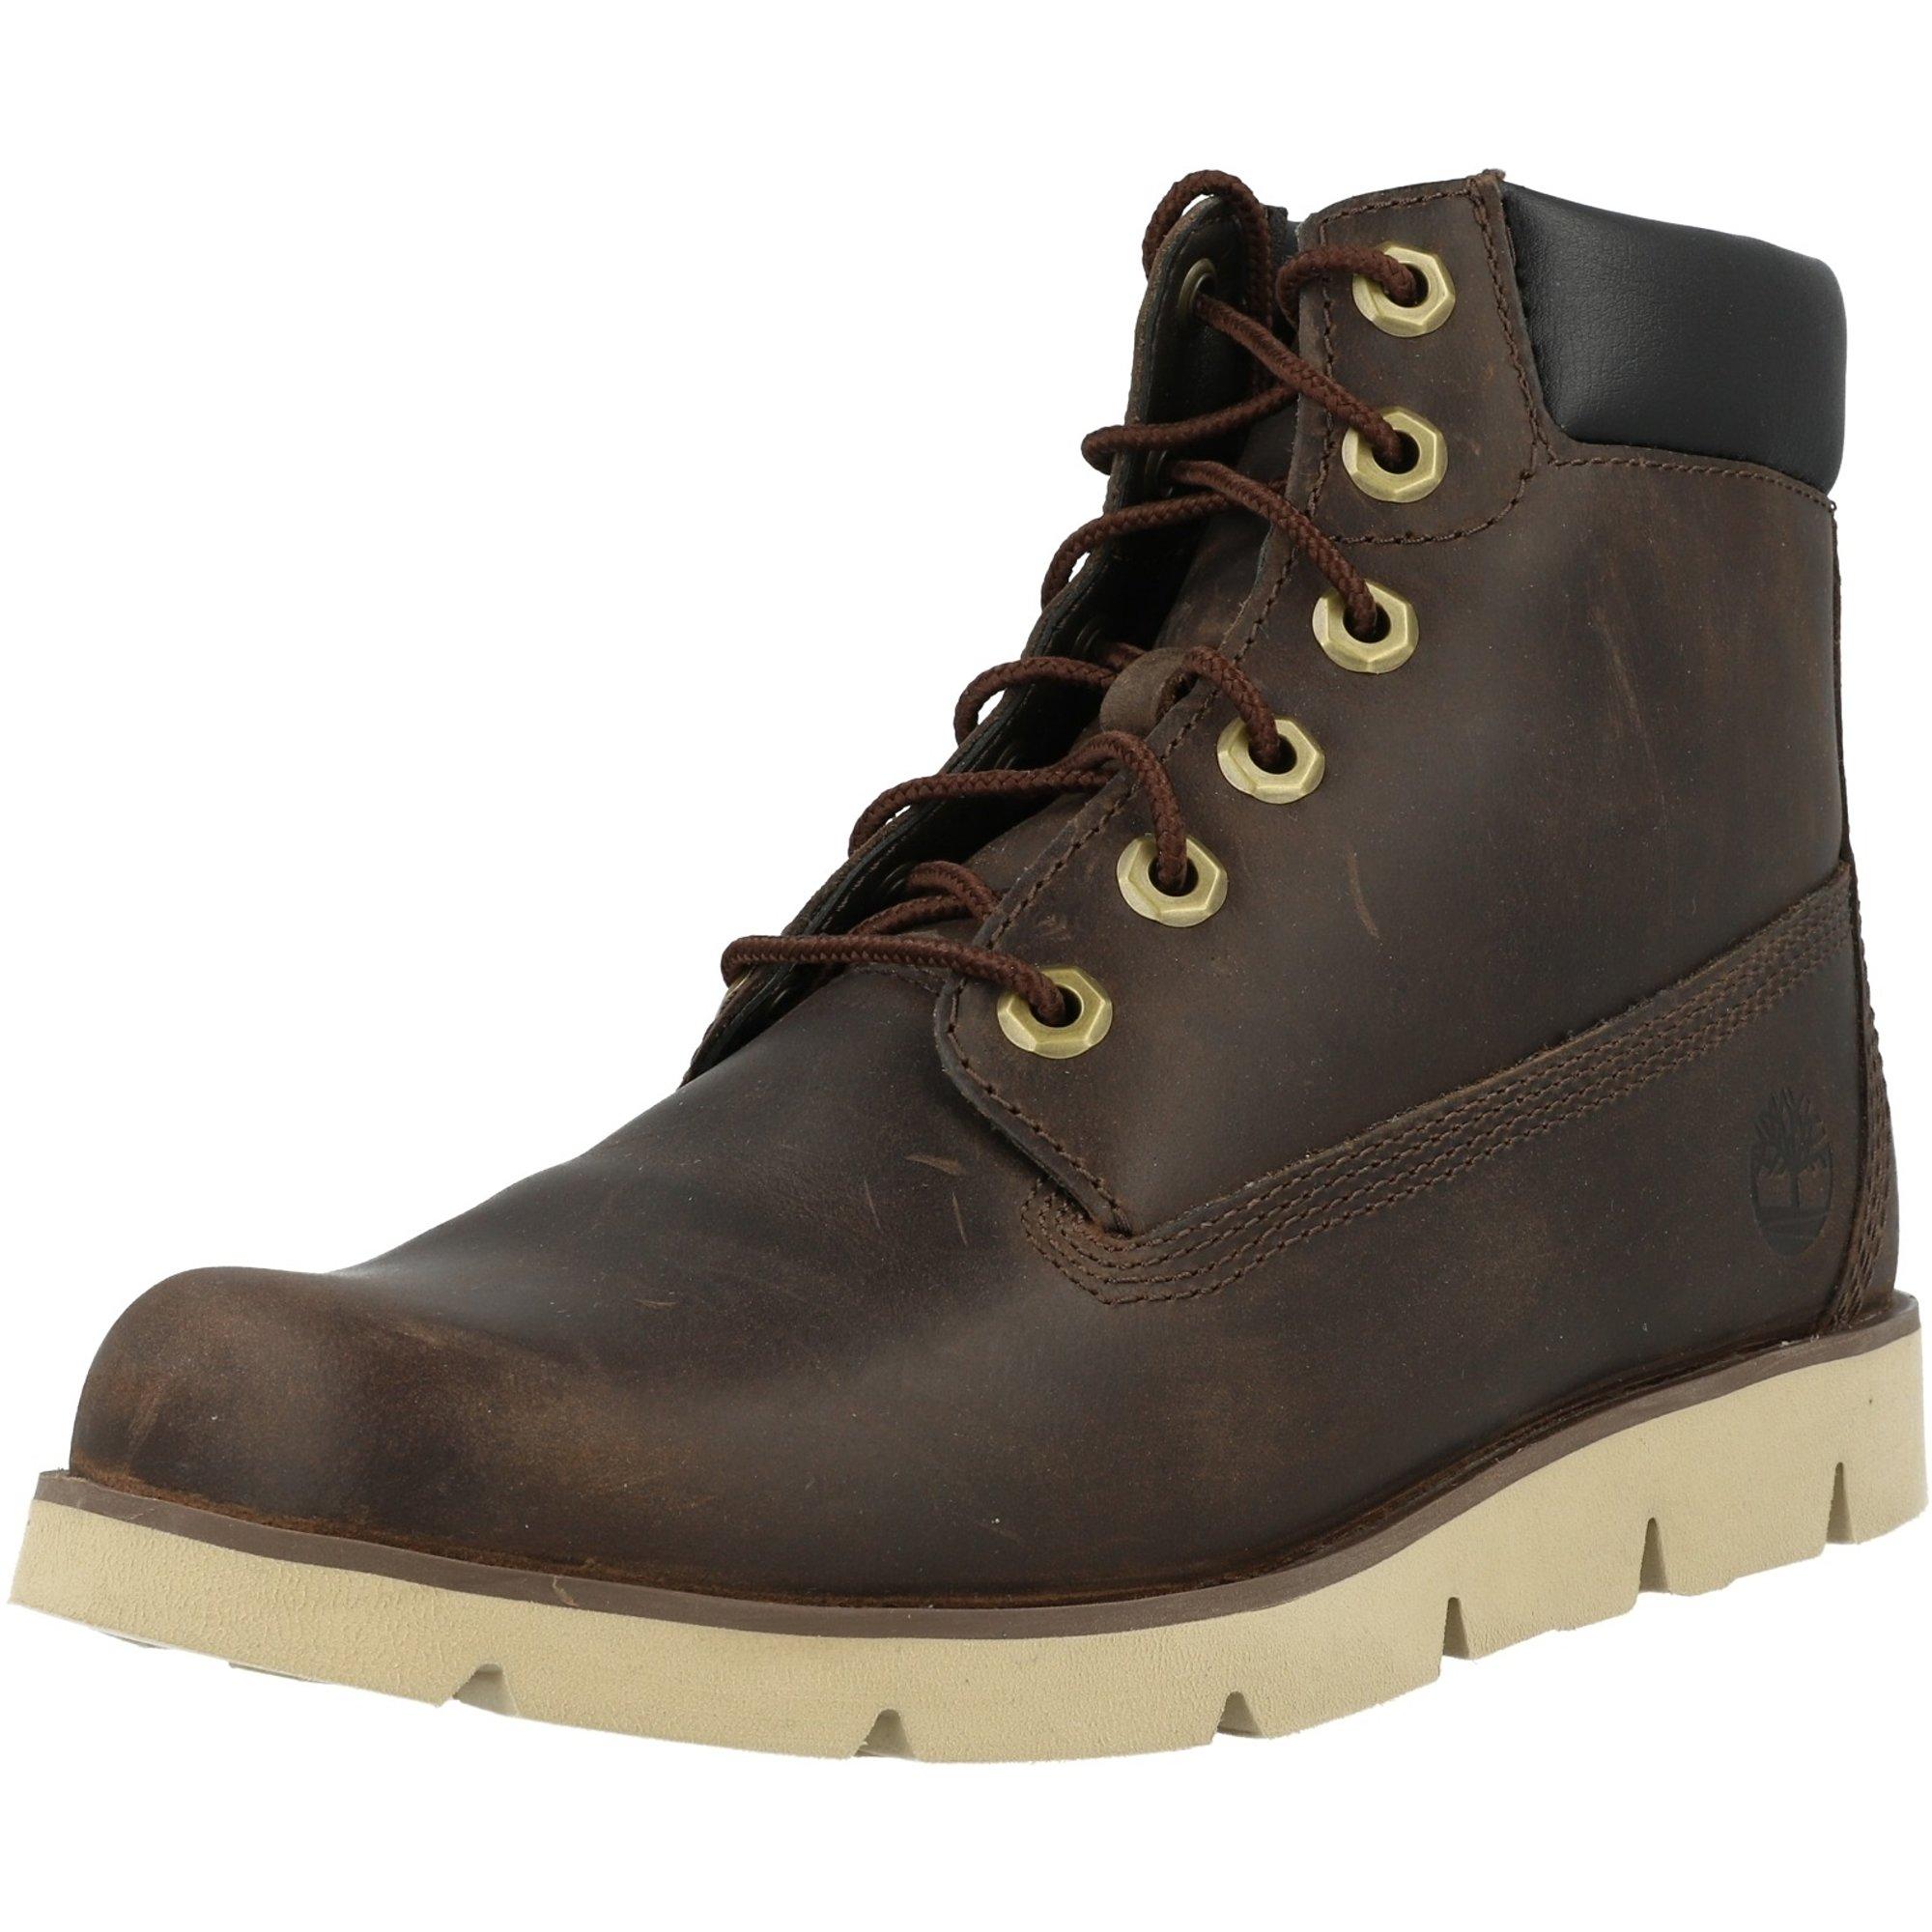 Timberland Radford 6 Inch Boot J Medium